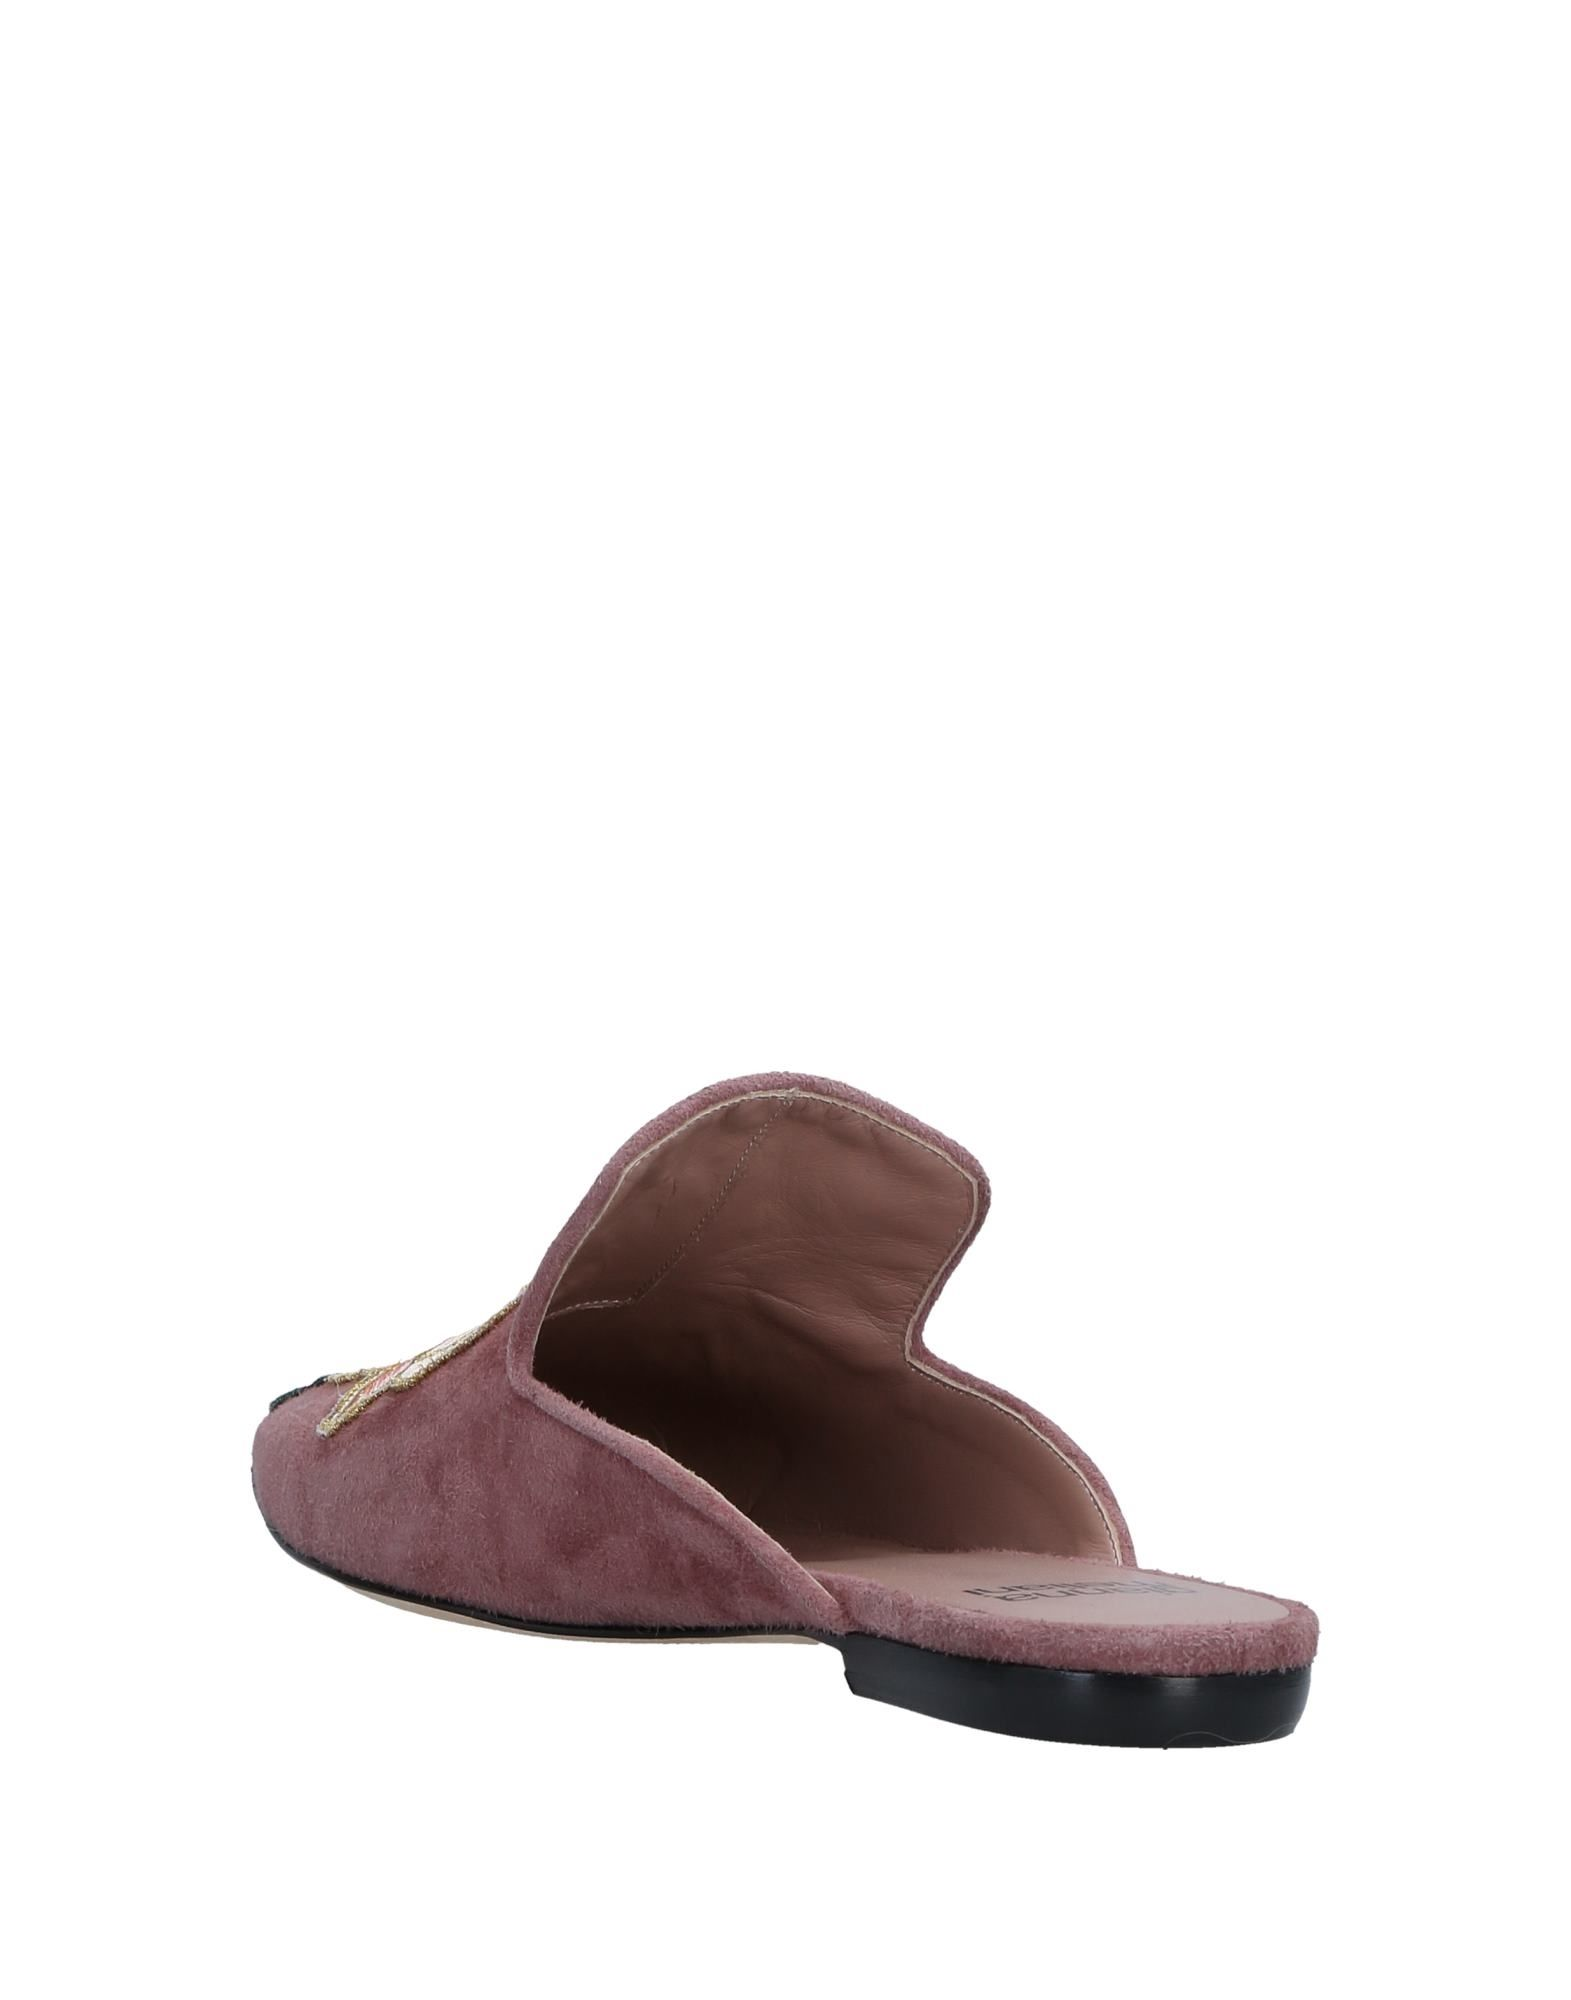 Stilvolle billige Schuhe Damen Gianna Meliani Pantoletten Damen Schuhe  11507082CM 7ce58f